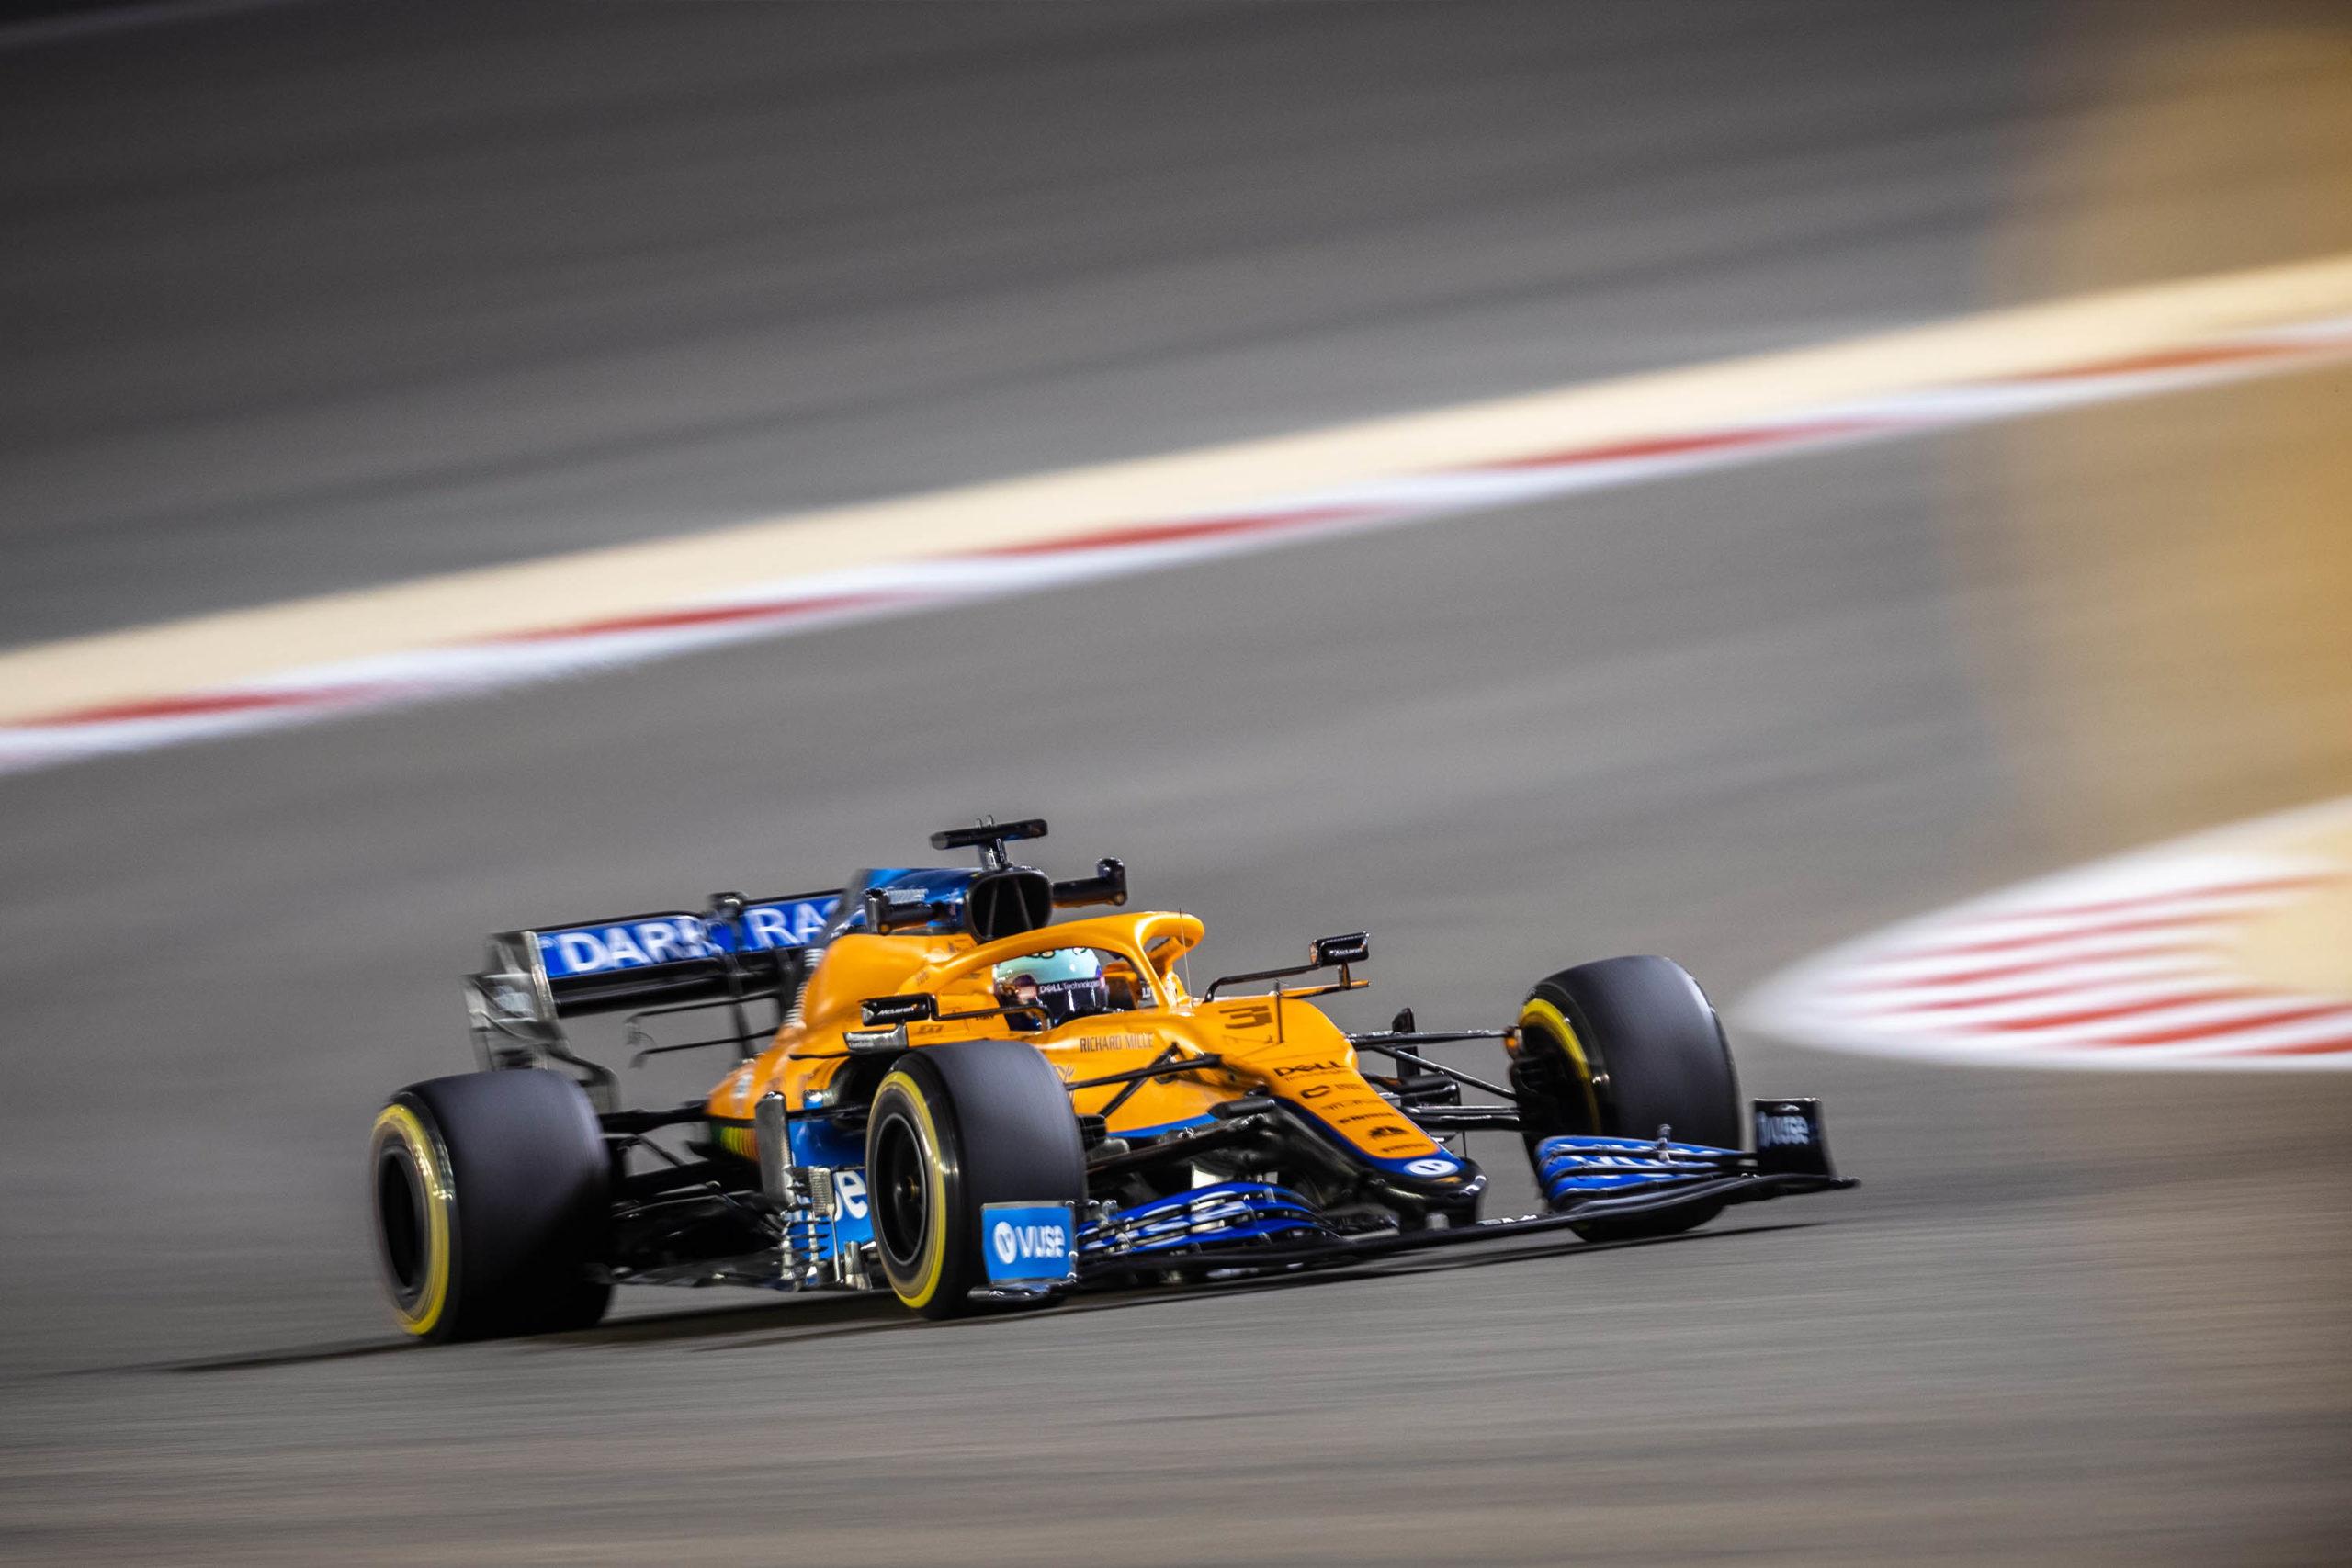 Daniel-Ricciardo-on-track-ahead-of-the-2021-Bahrain-Grand-Prix